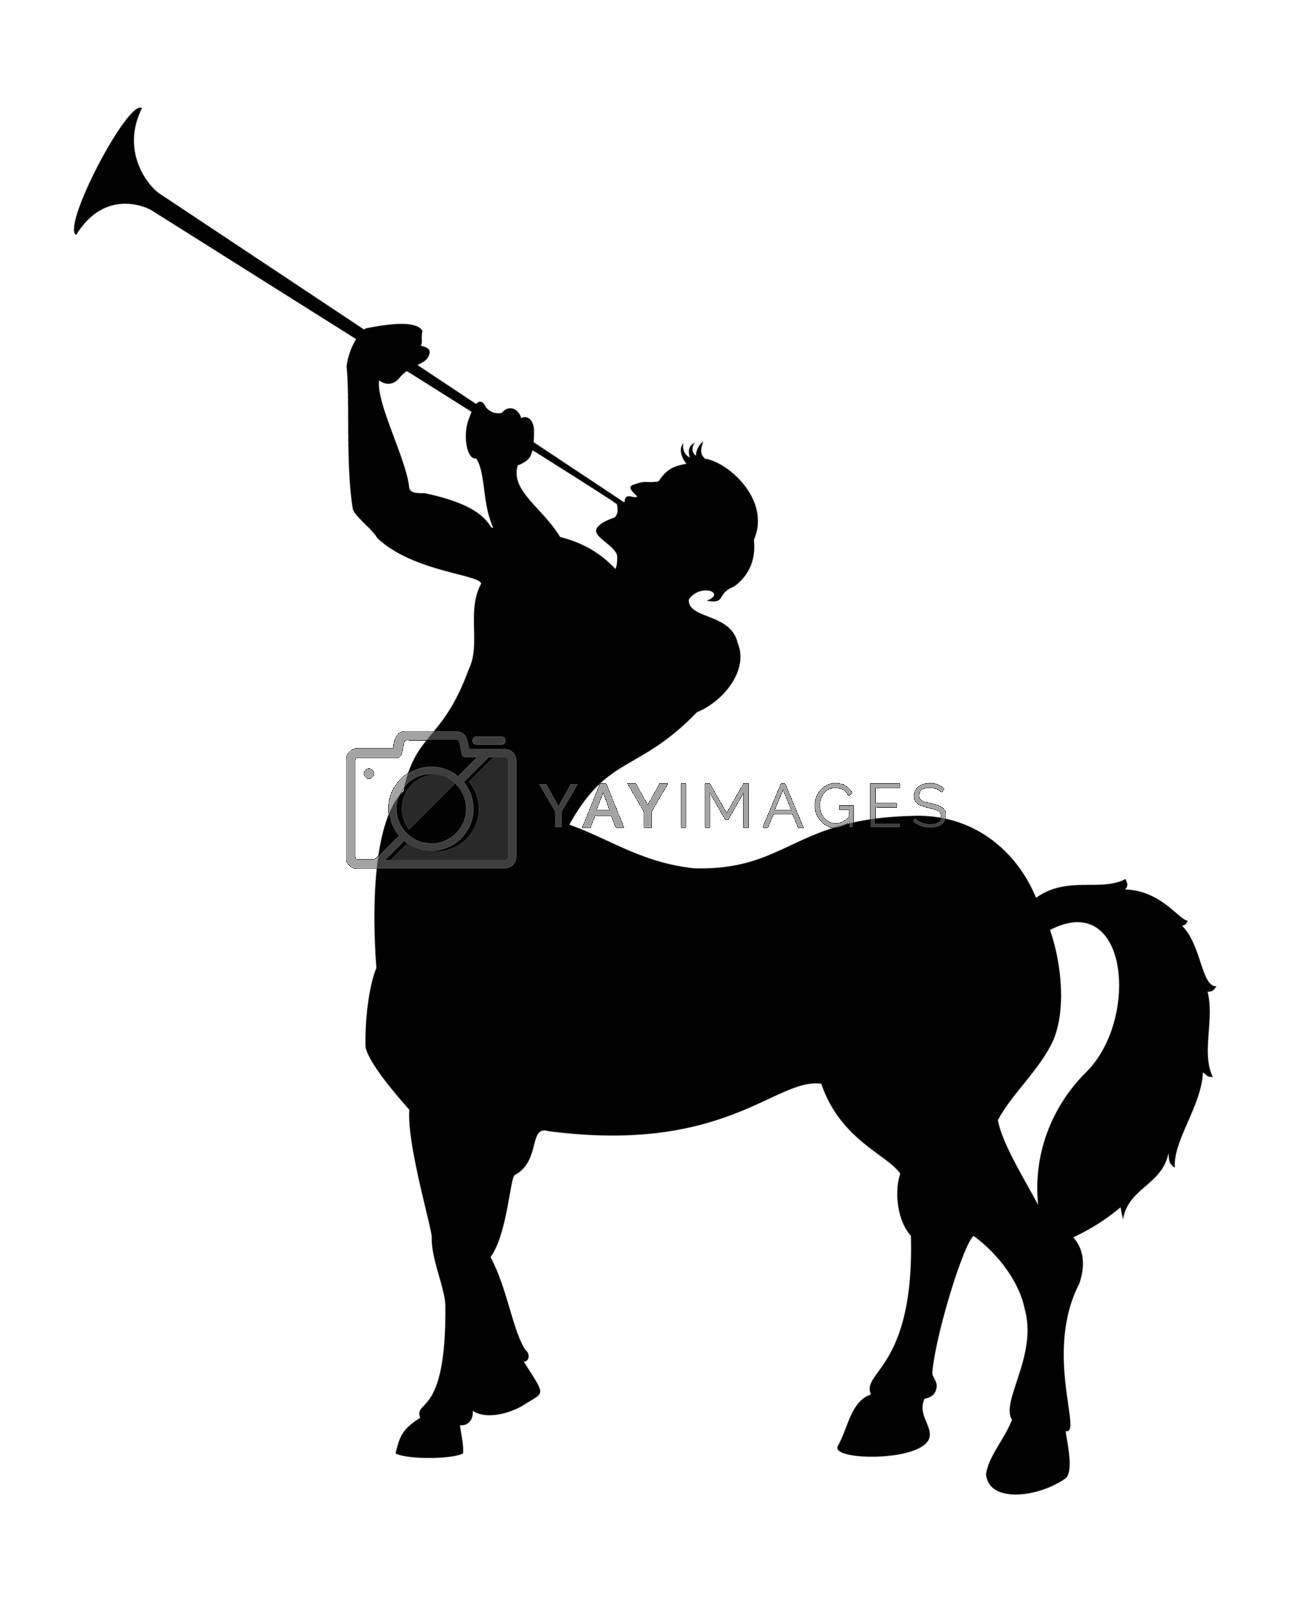 The centaur blows a black silhouette. A vector illustration